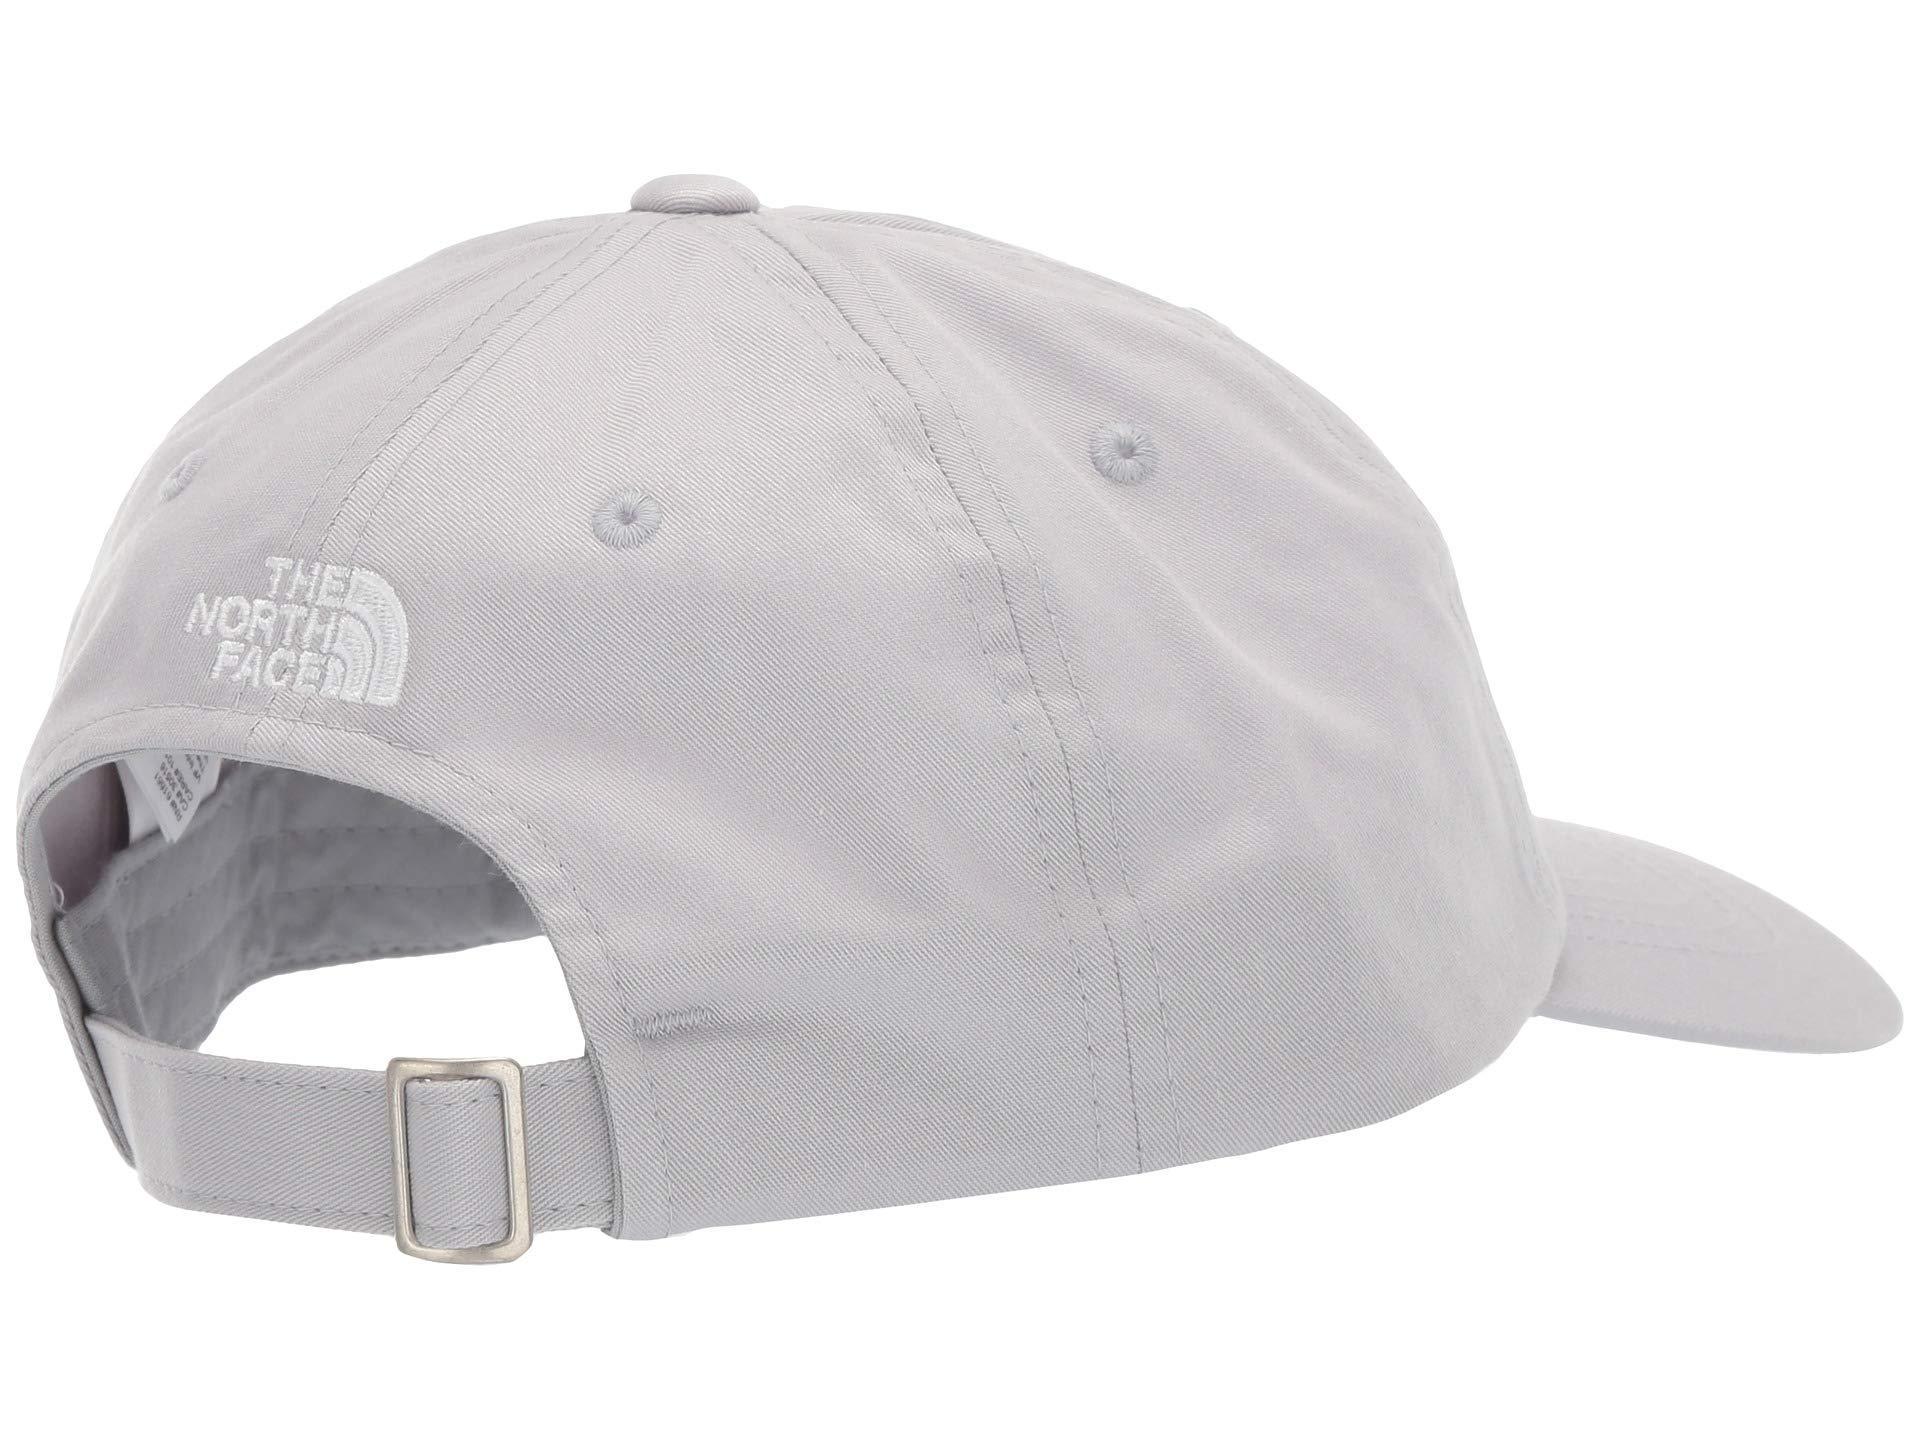 1b26c3aa5 Men's Gray The Norm Hat (tnf Black/tnf White Hatchet Embroidery) Baseball  Caps